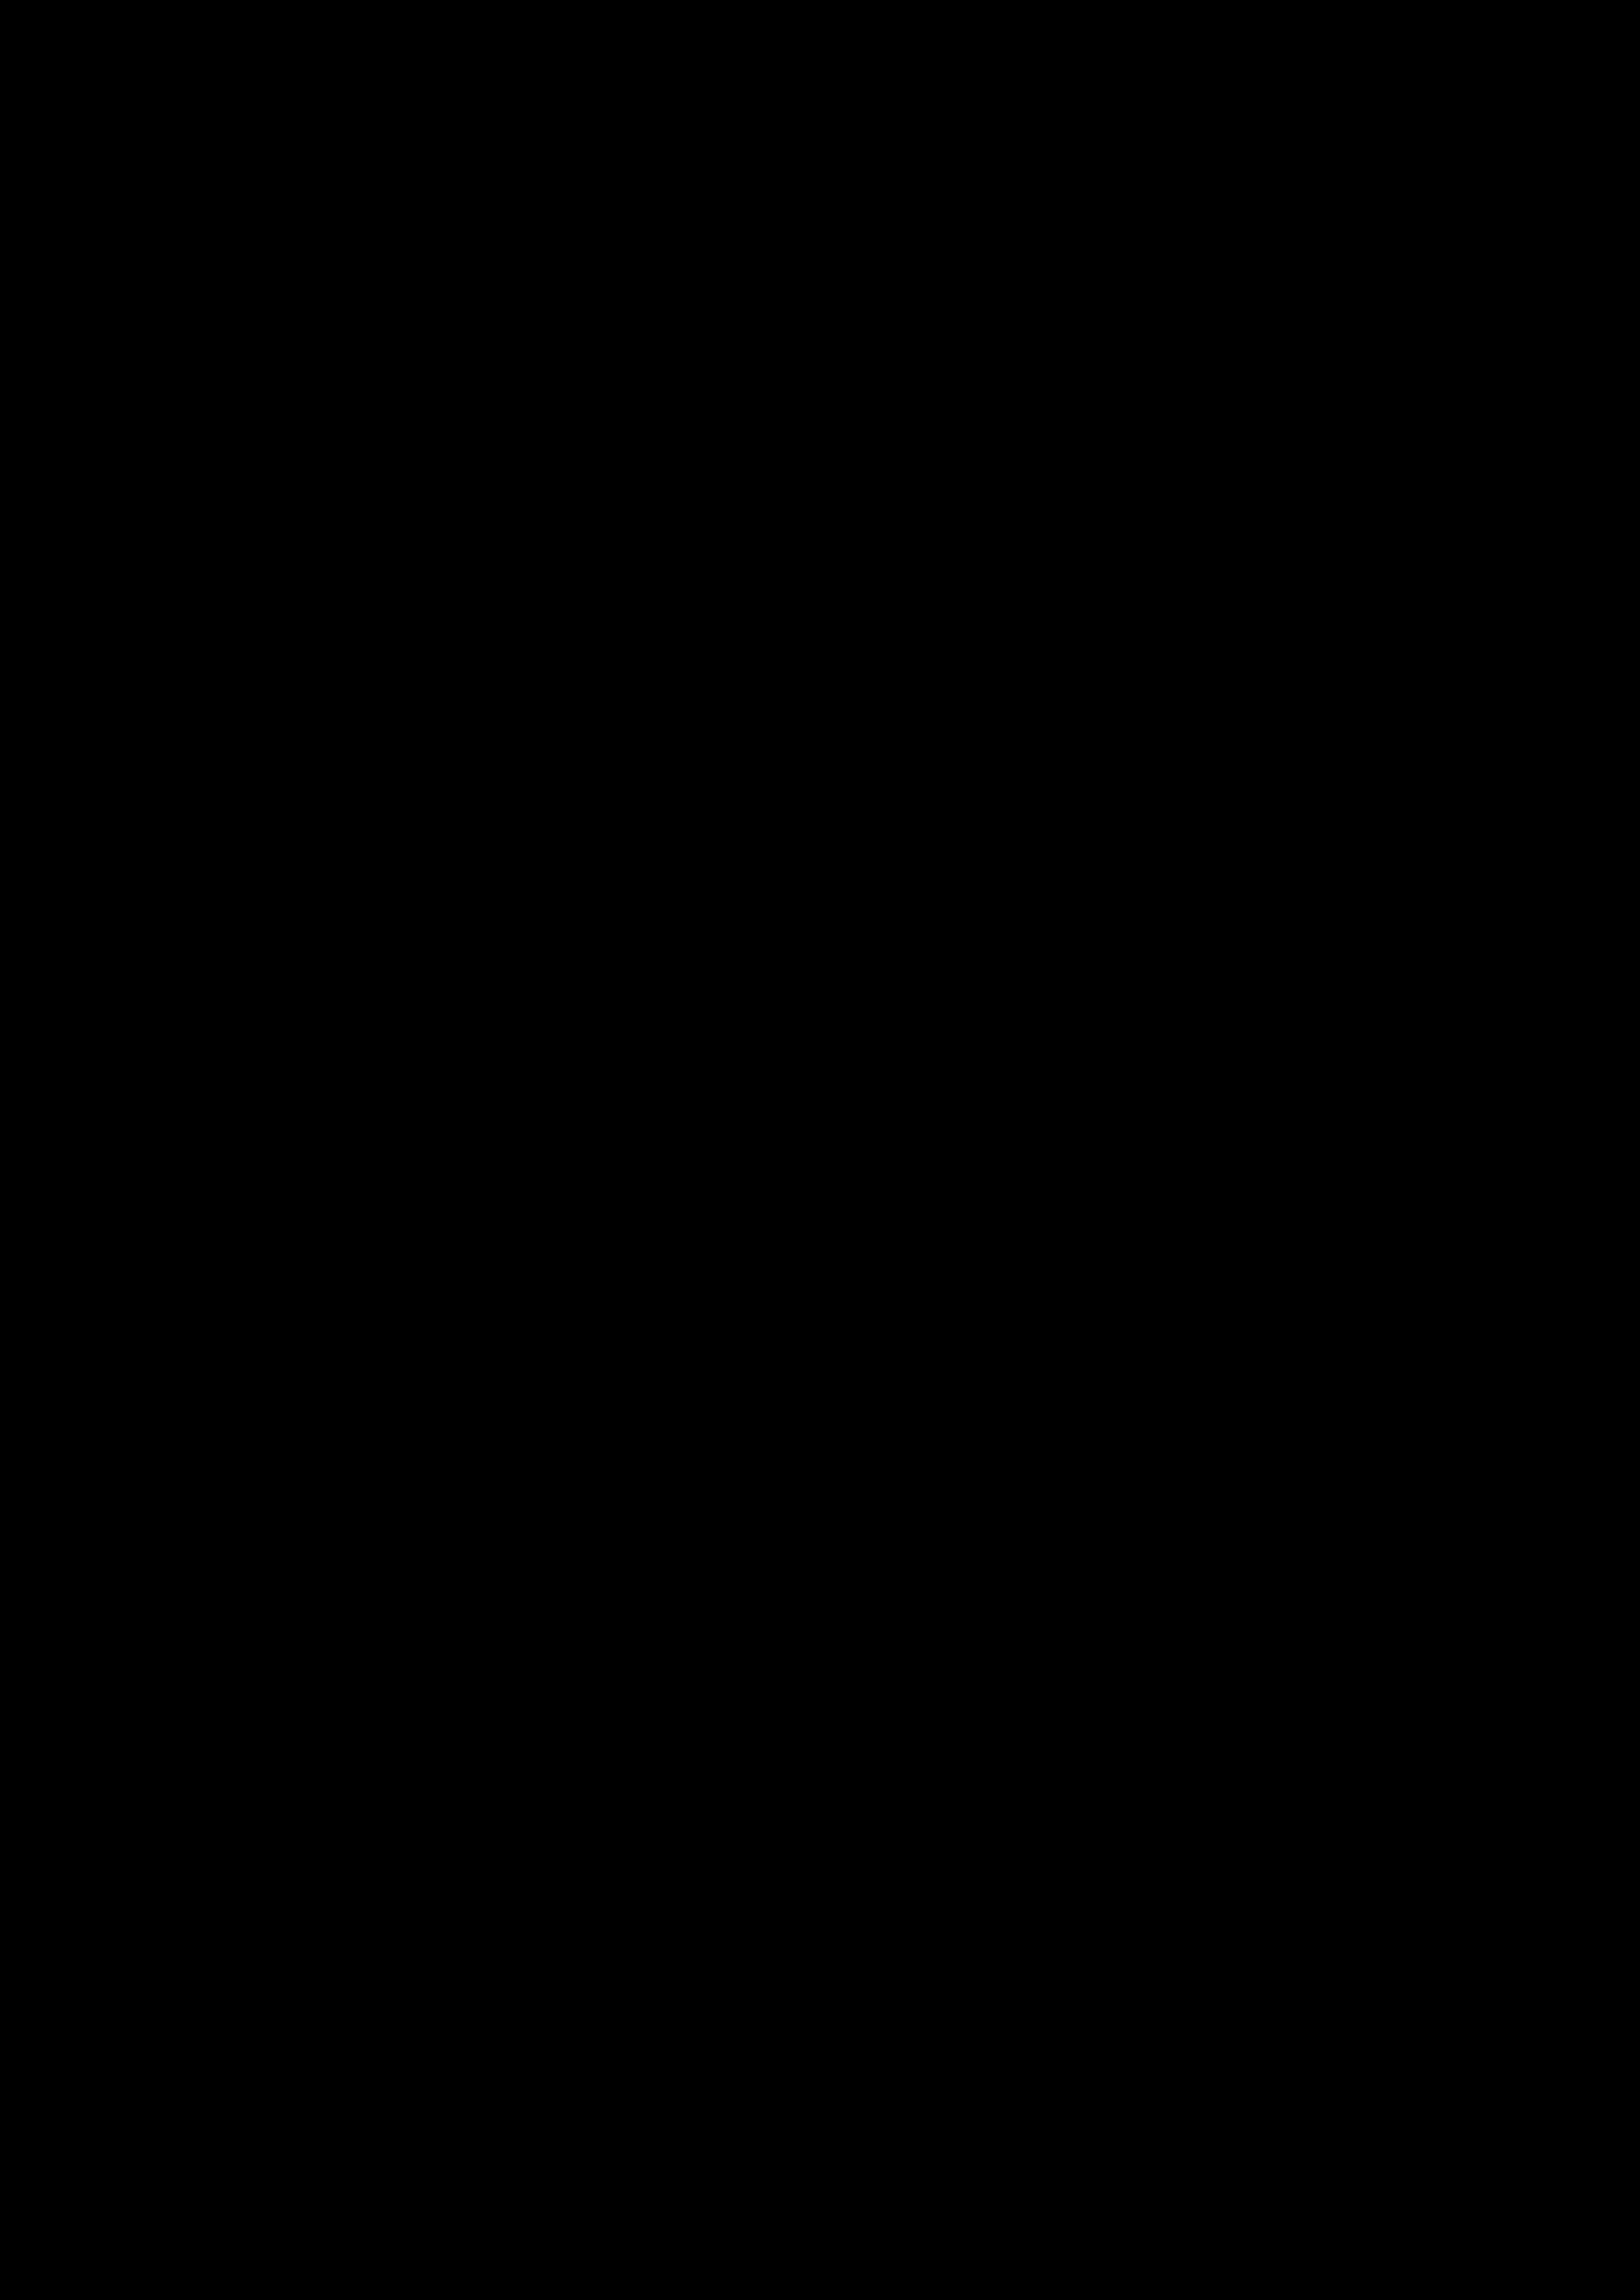 Hawk clip art at vector free image